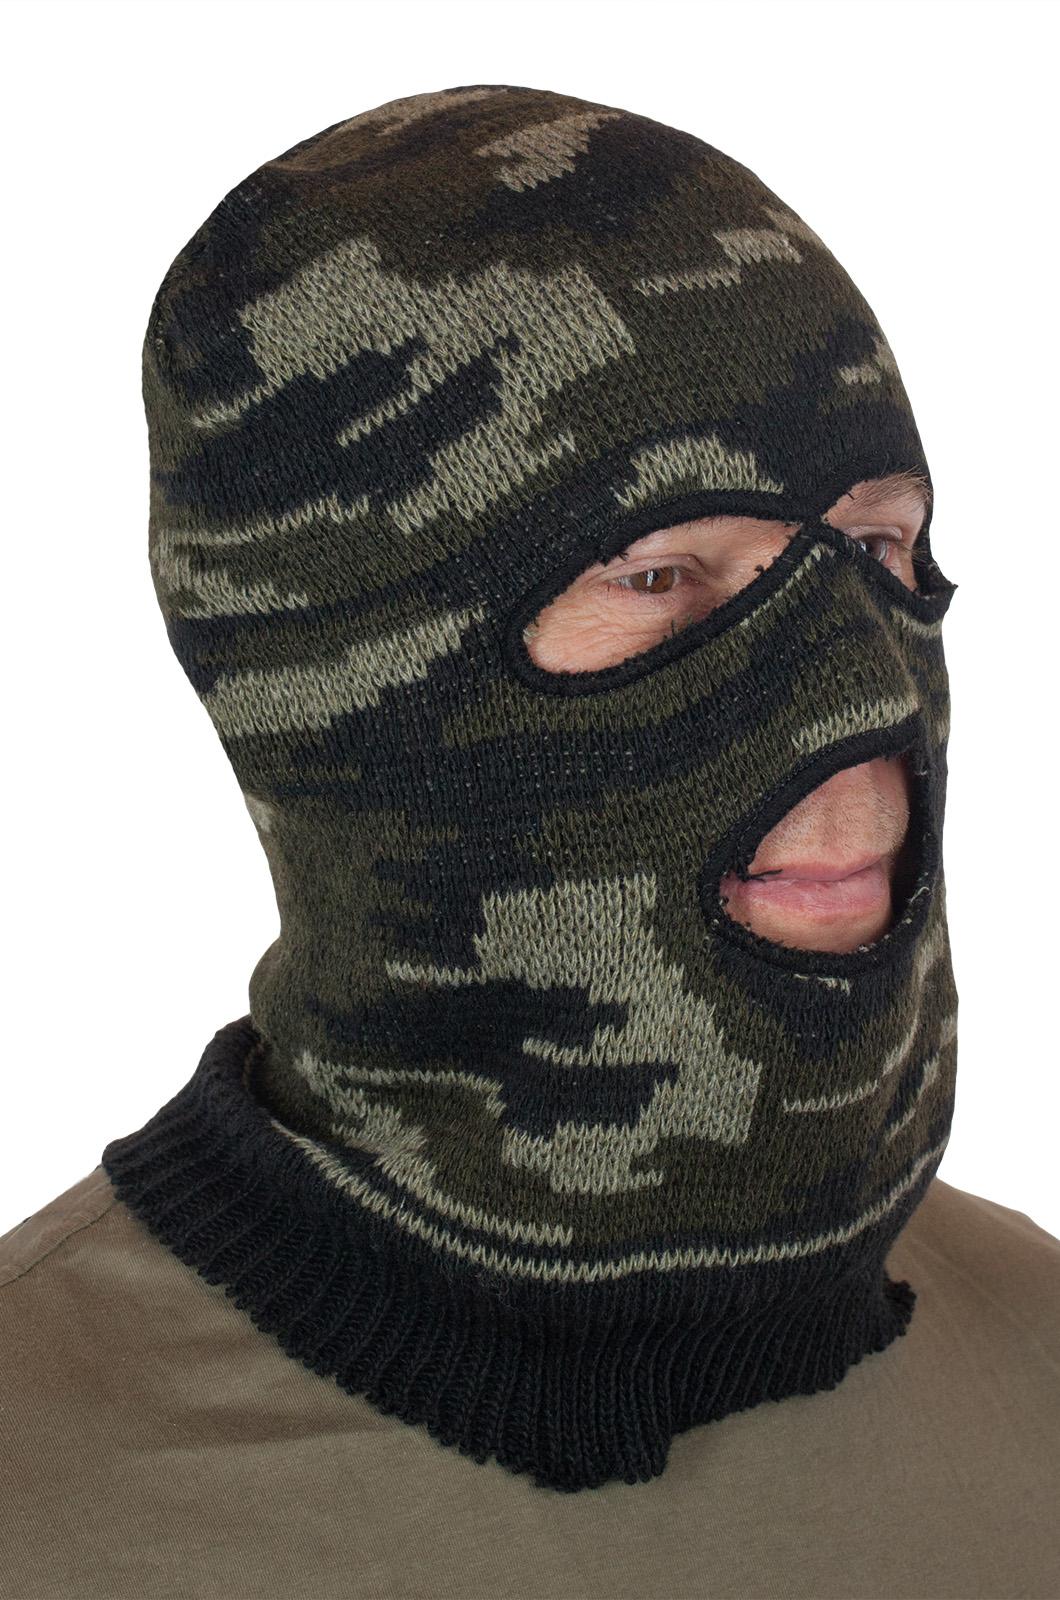 Армейская маска камуфляжная по выгодной цене